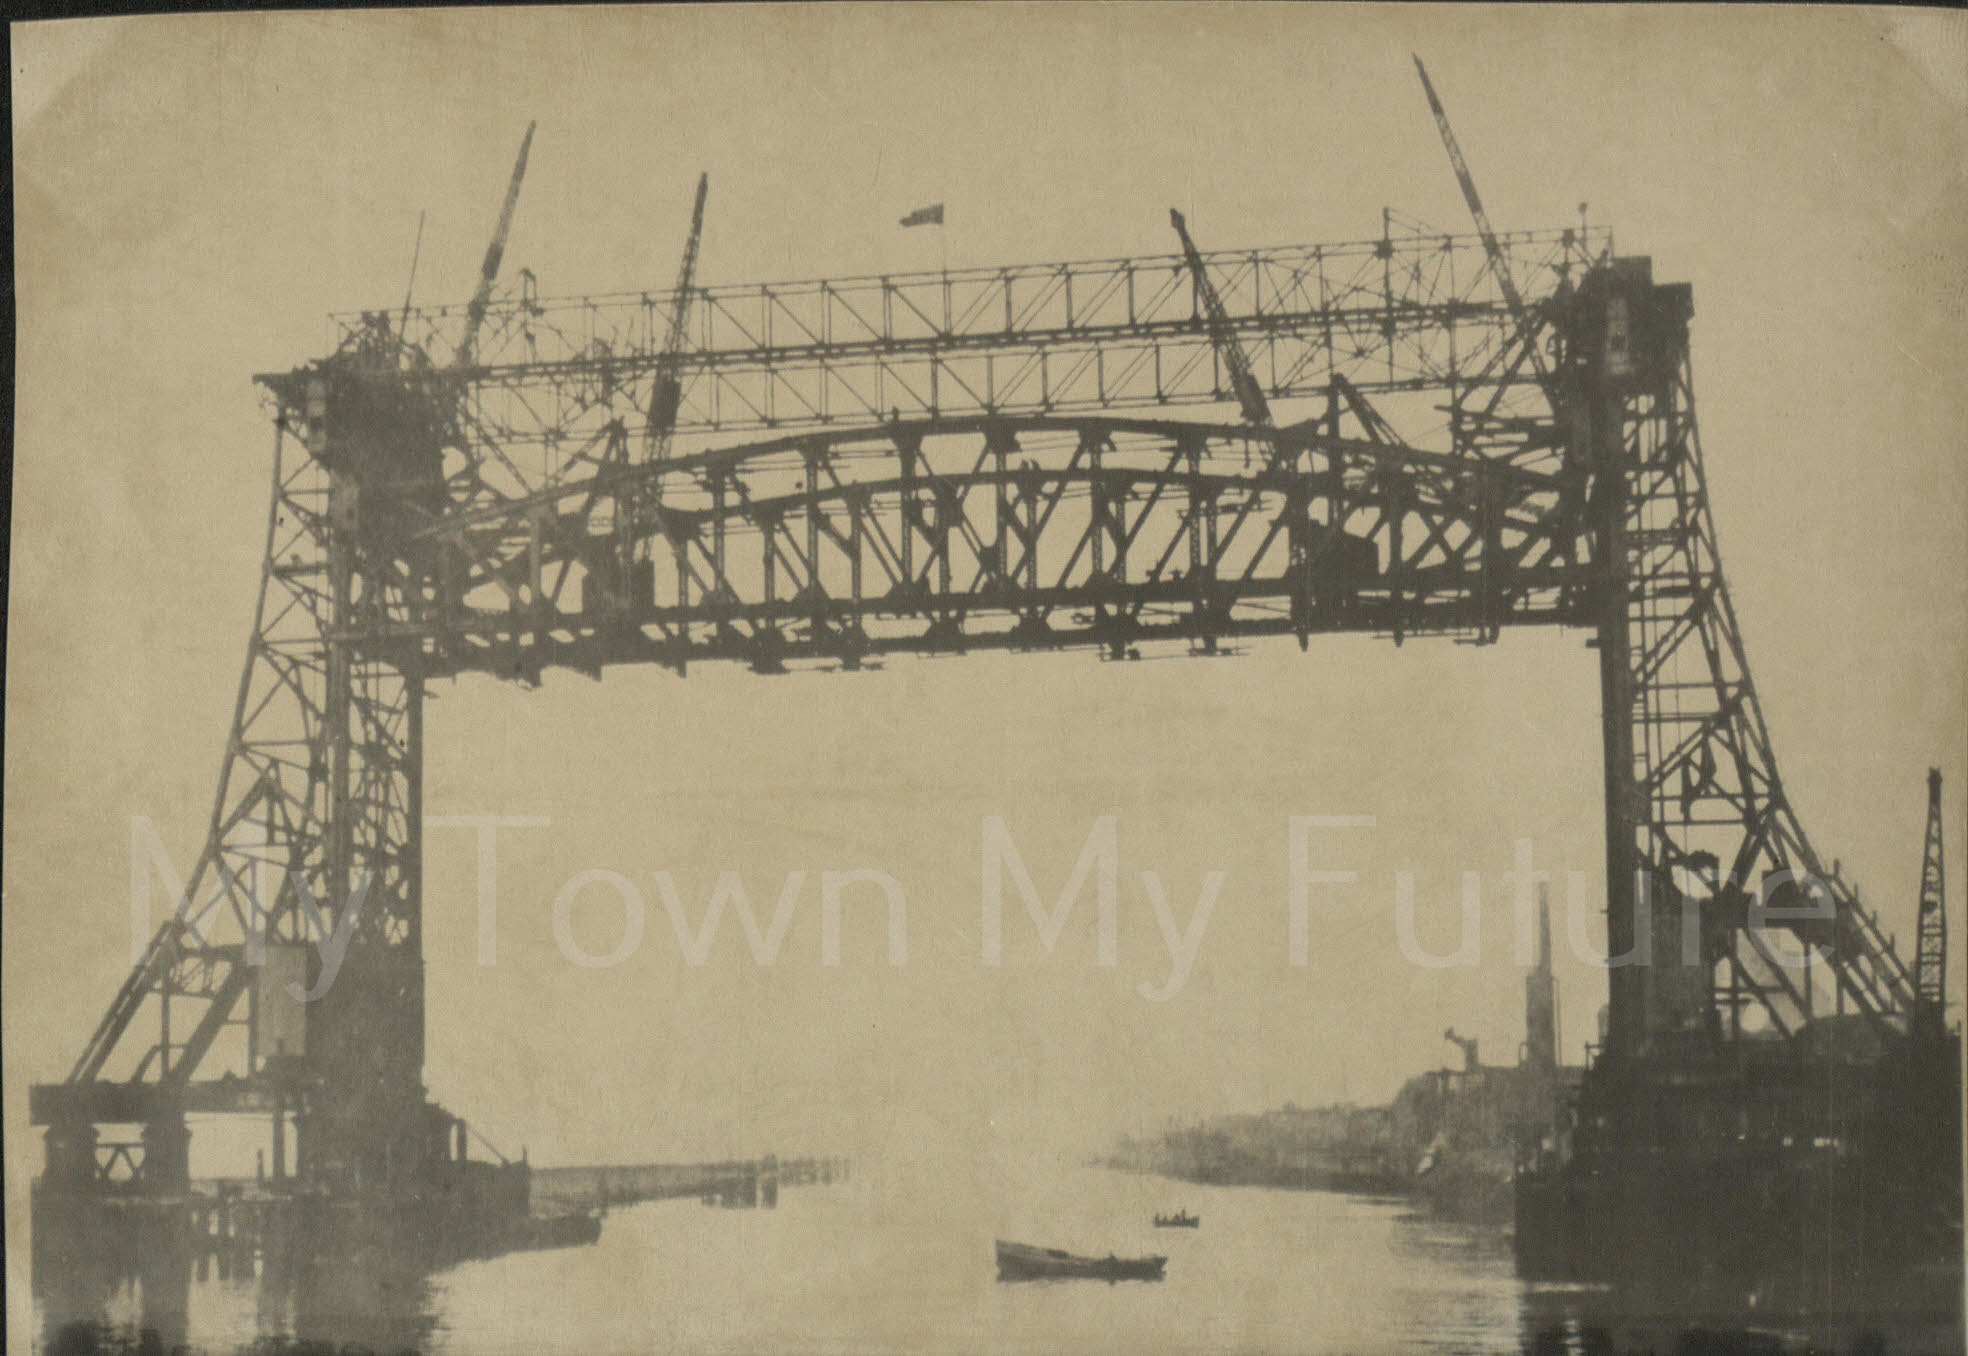 Newport Bridge - Under Construction